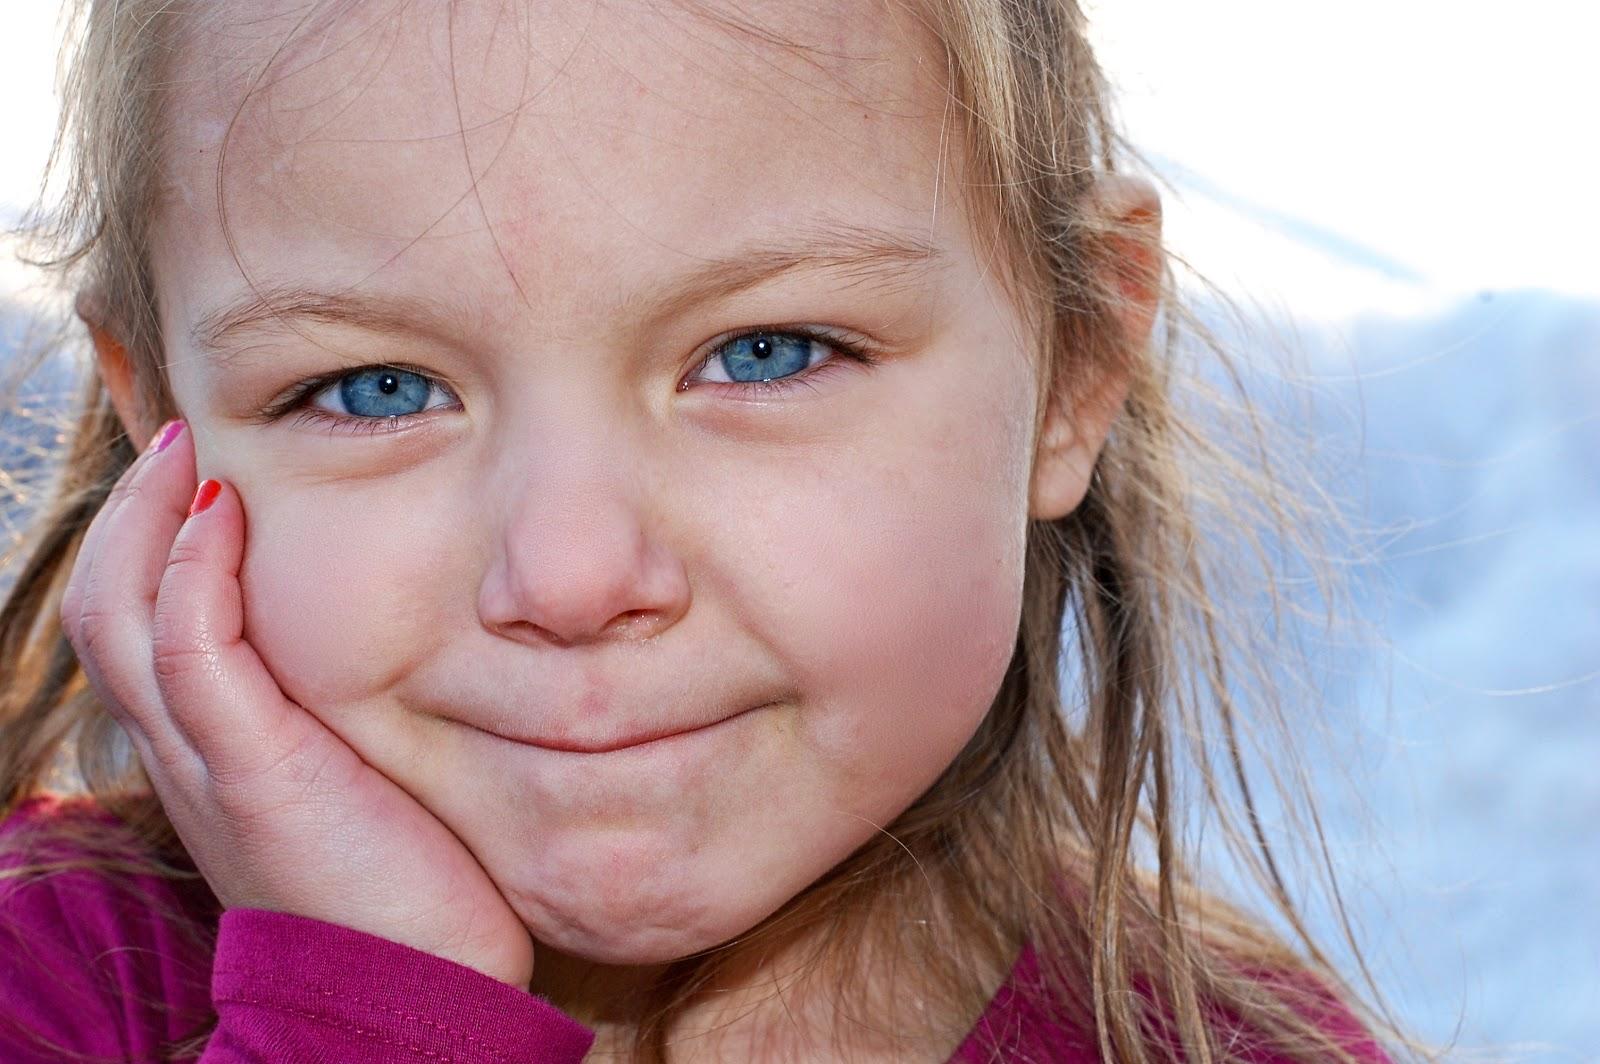 ... face profile smiling child face black child face sad child face child Face Drawing Profile